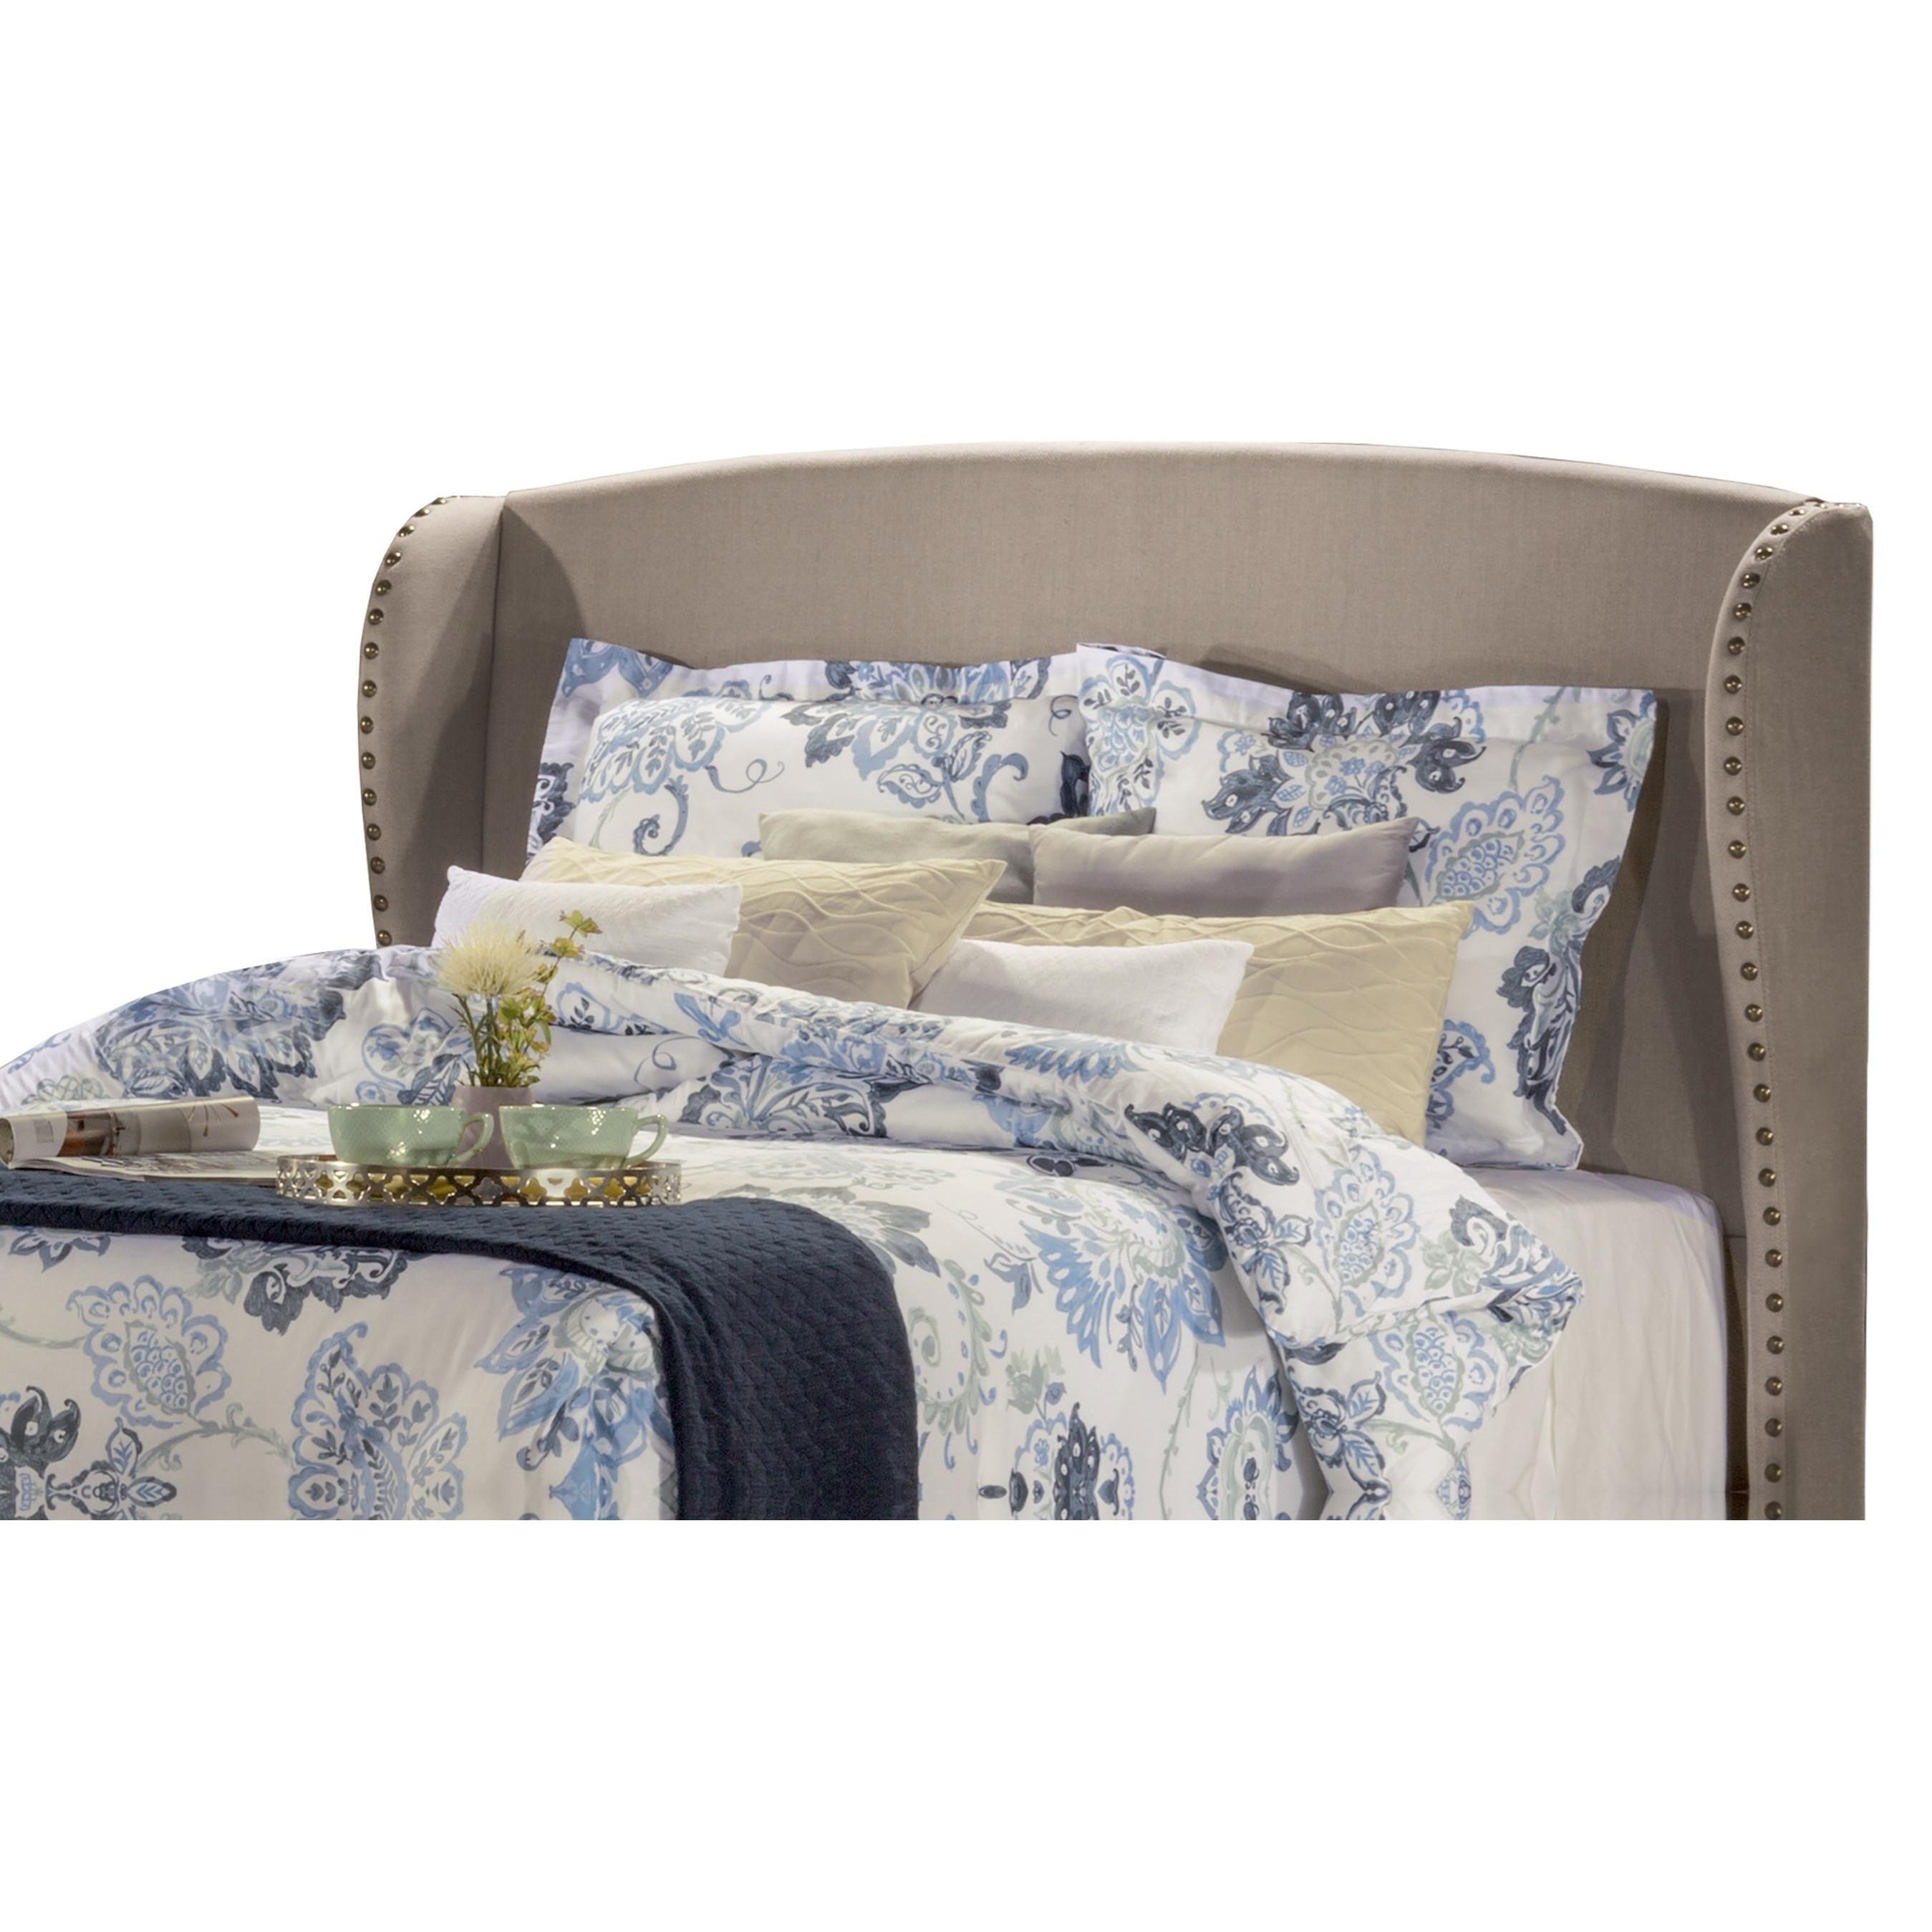 Hillsdale Upholstered Beds King Headboard with Frame - Item Number: 1930HK